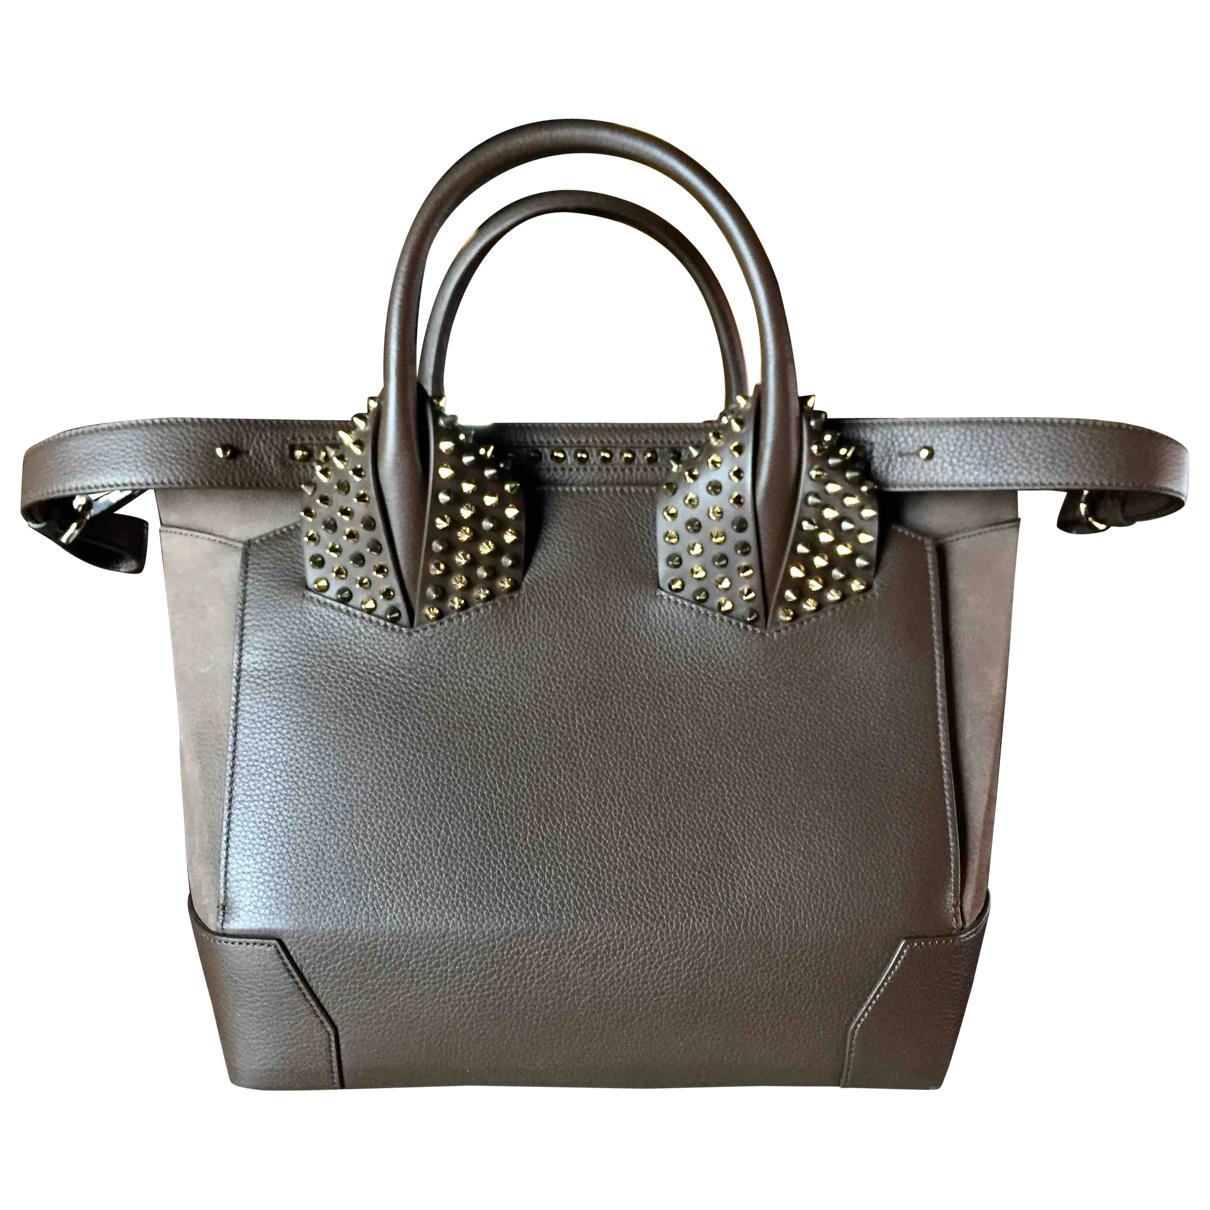 Christian Louboutin Eloise Handtasche in  Braun Leder